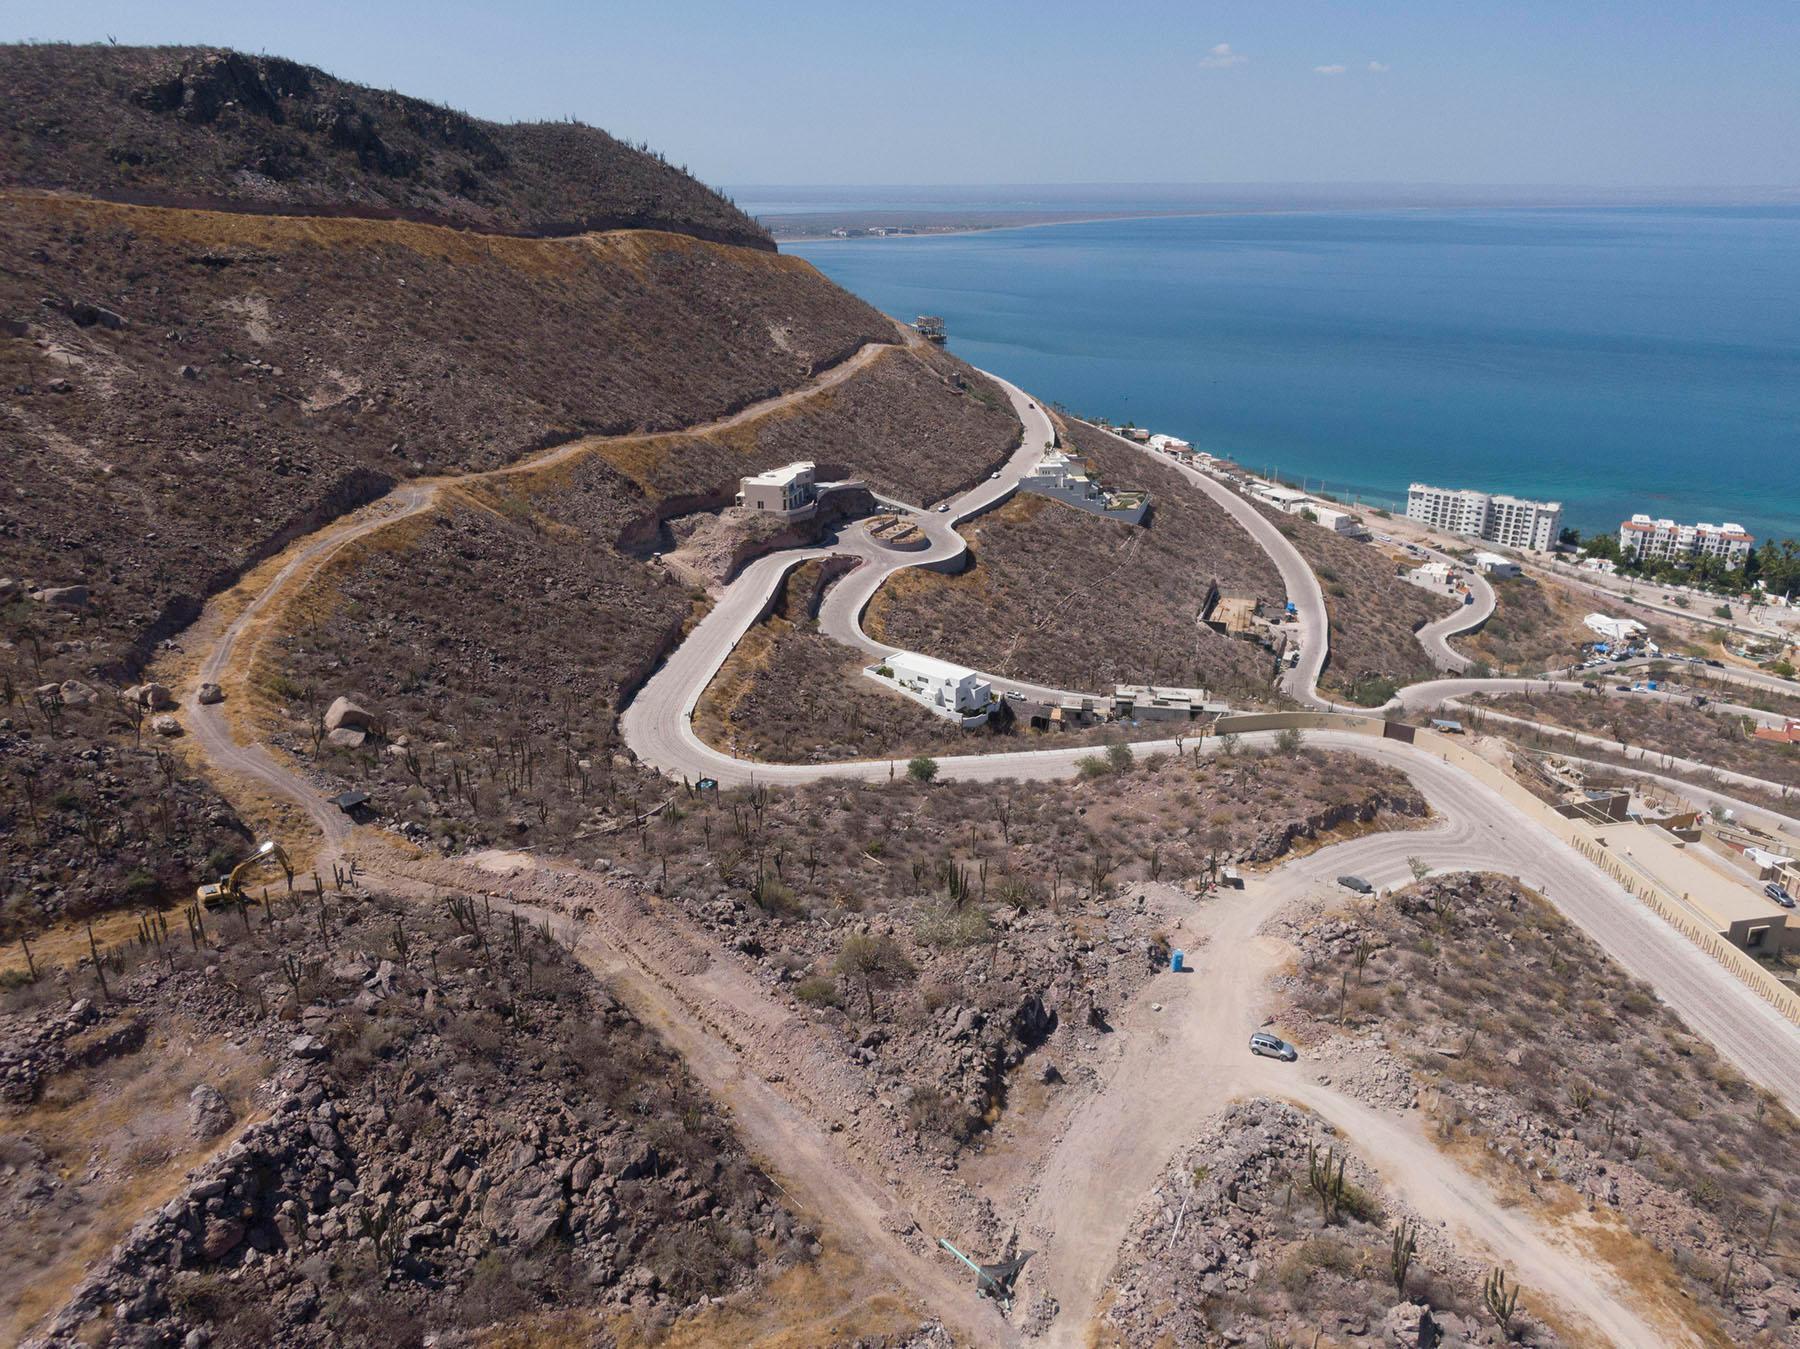 Camino de La Grava Pedregal La Paz